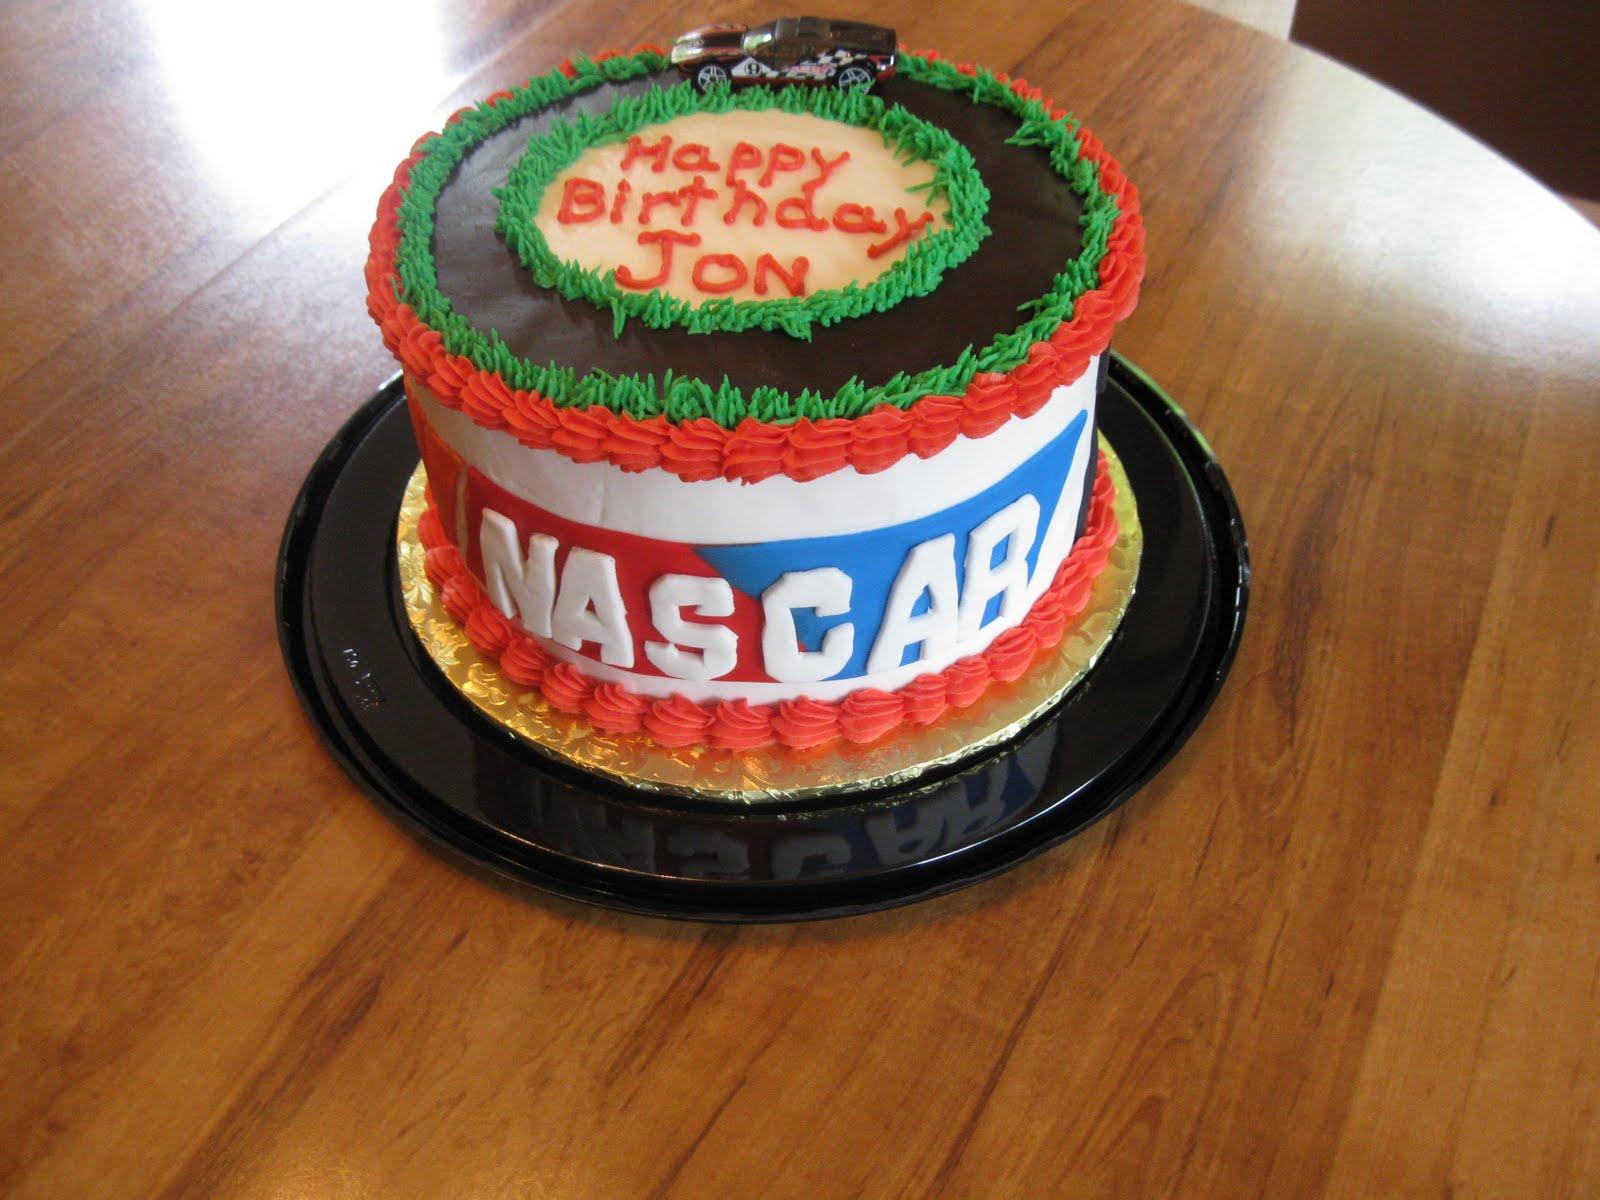 Nascar Birthday Cookie Cake